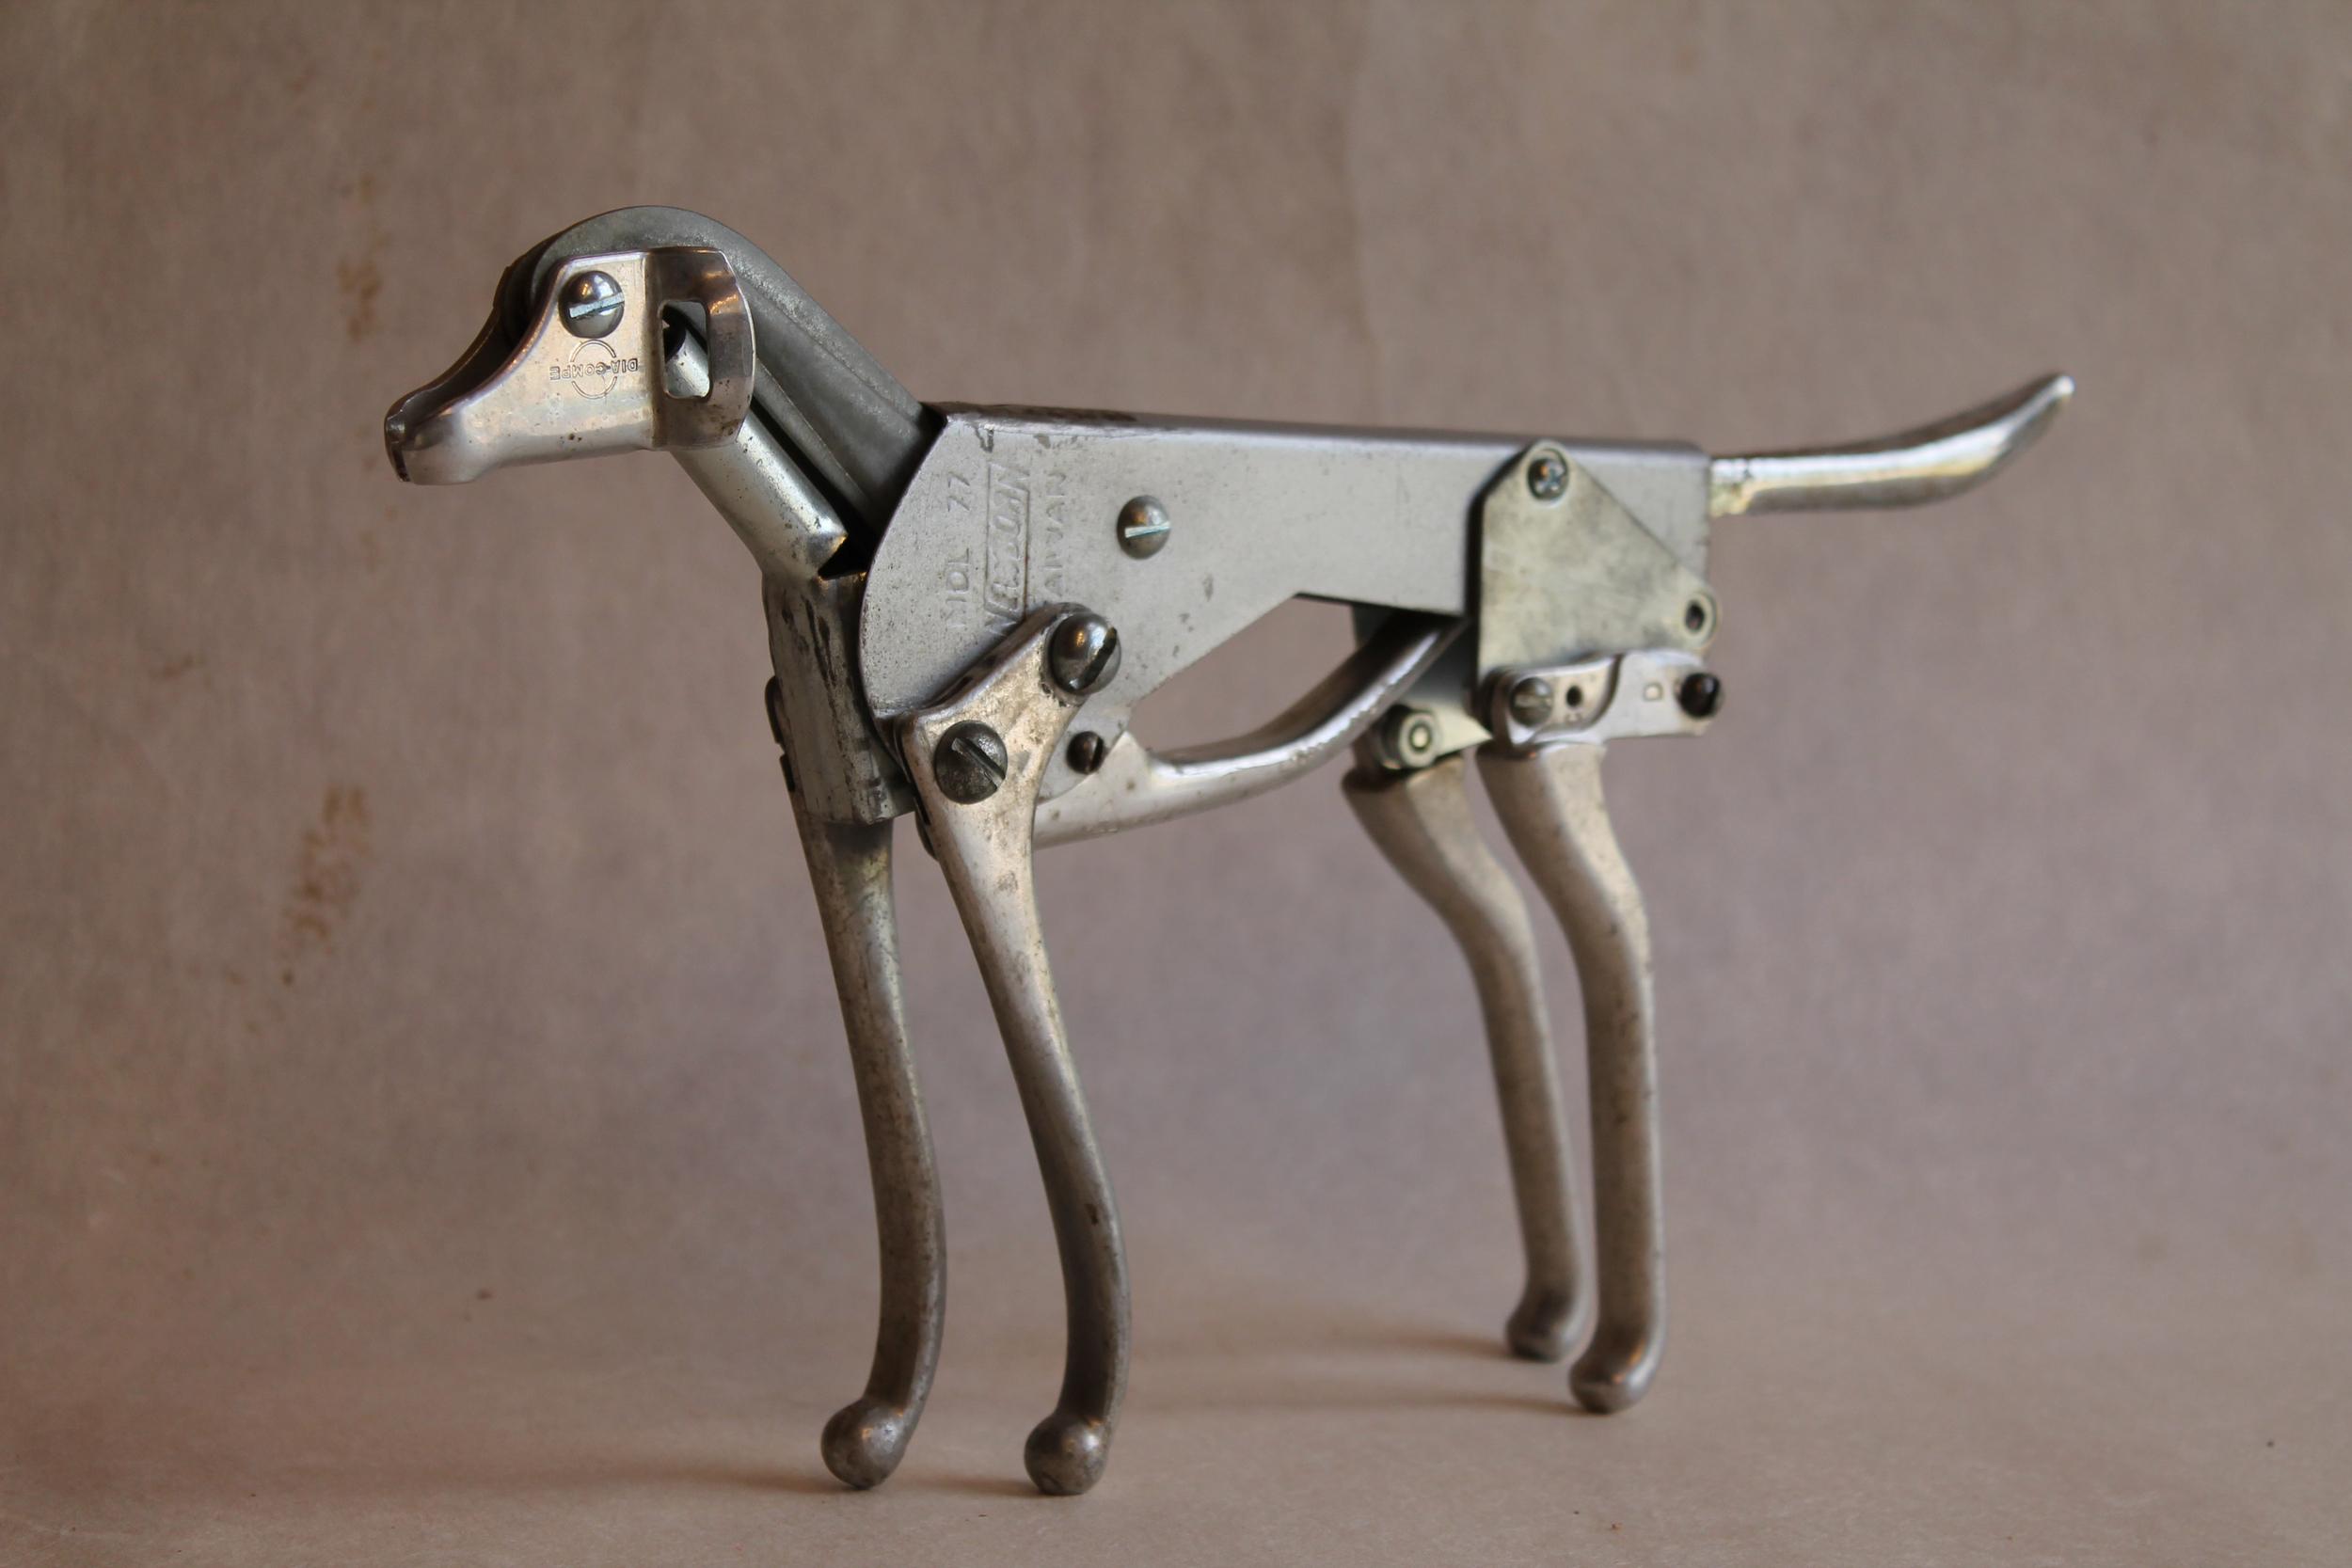 6 Brake Lever Dog